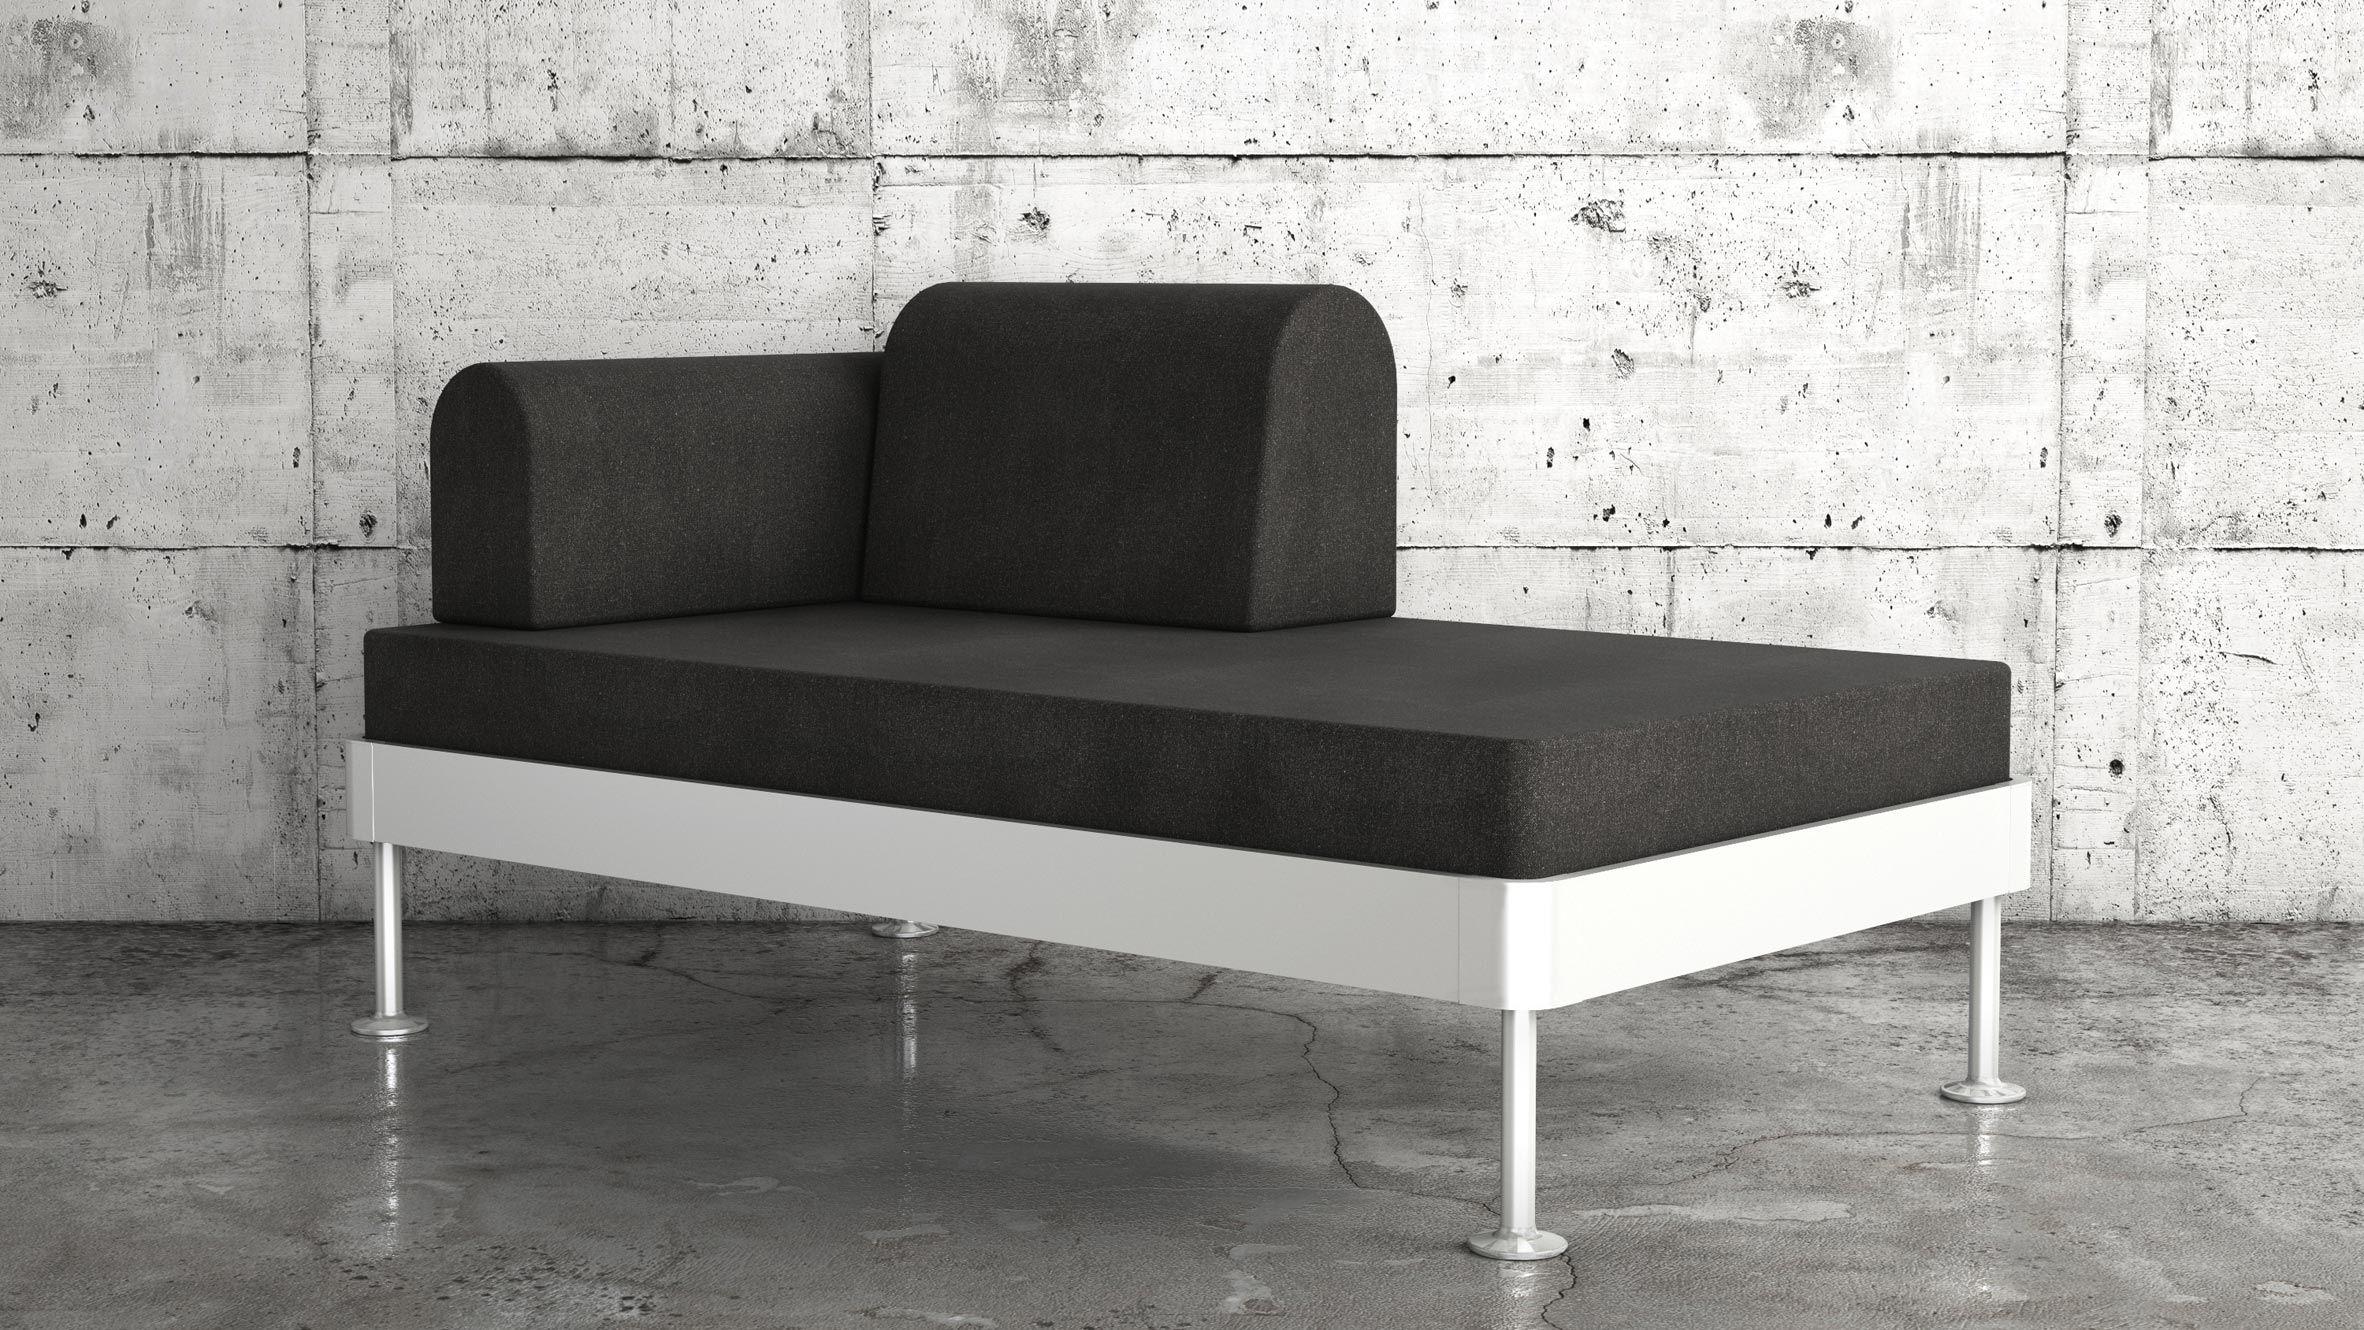 Ikea S Hackable Sofa Bed Will Debut At Milan Design Week New